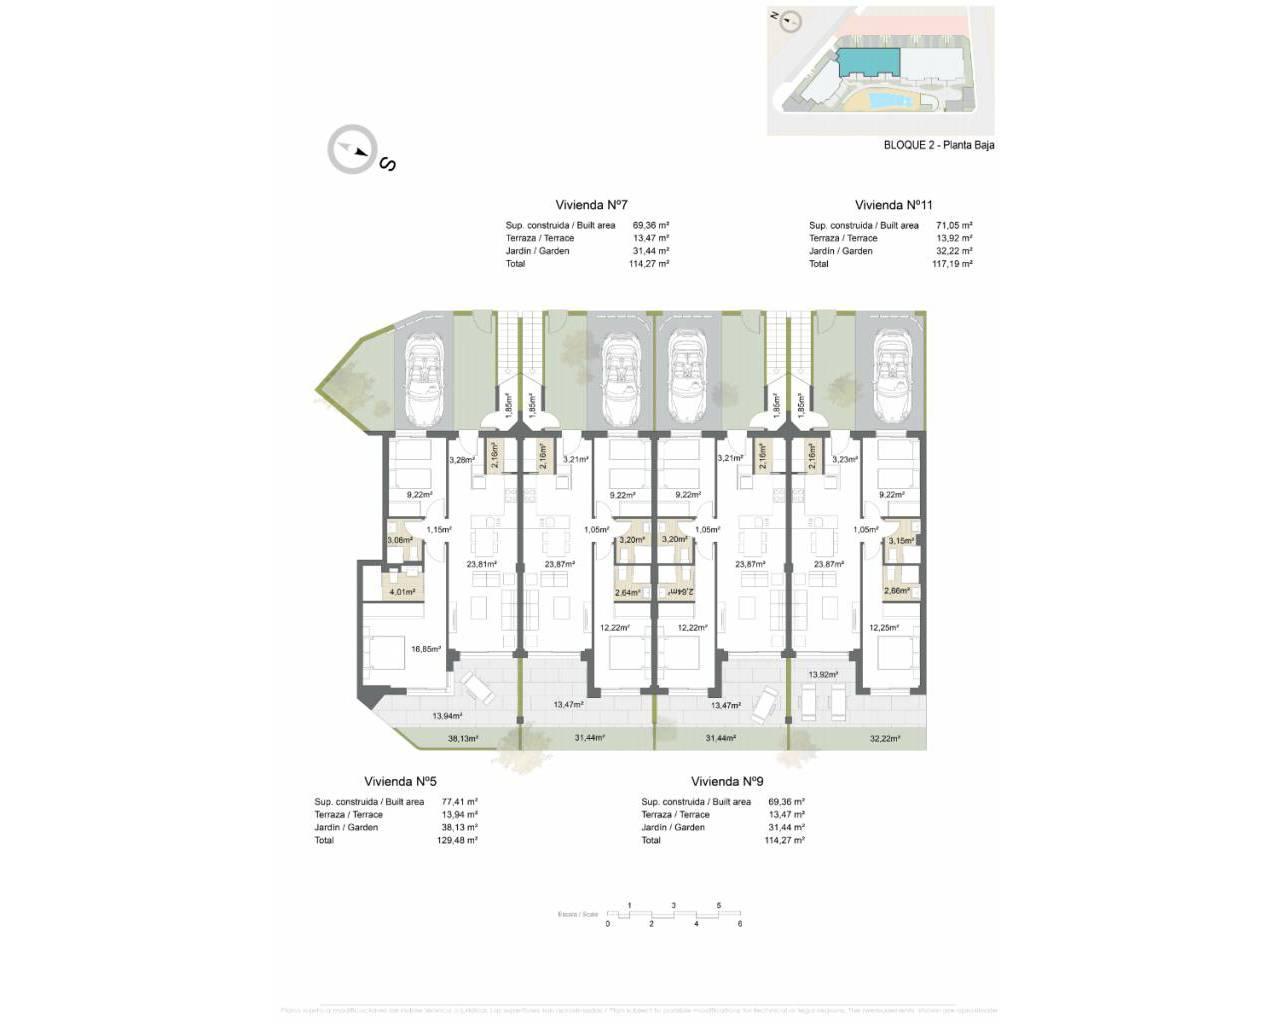 nieuwbouw-appartement-pilar-de-la-horadada_5793_xl